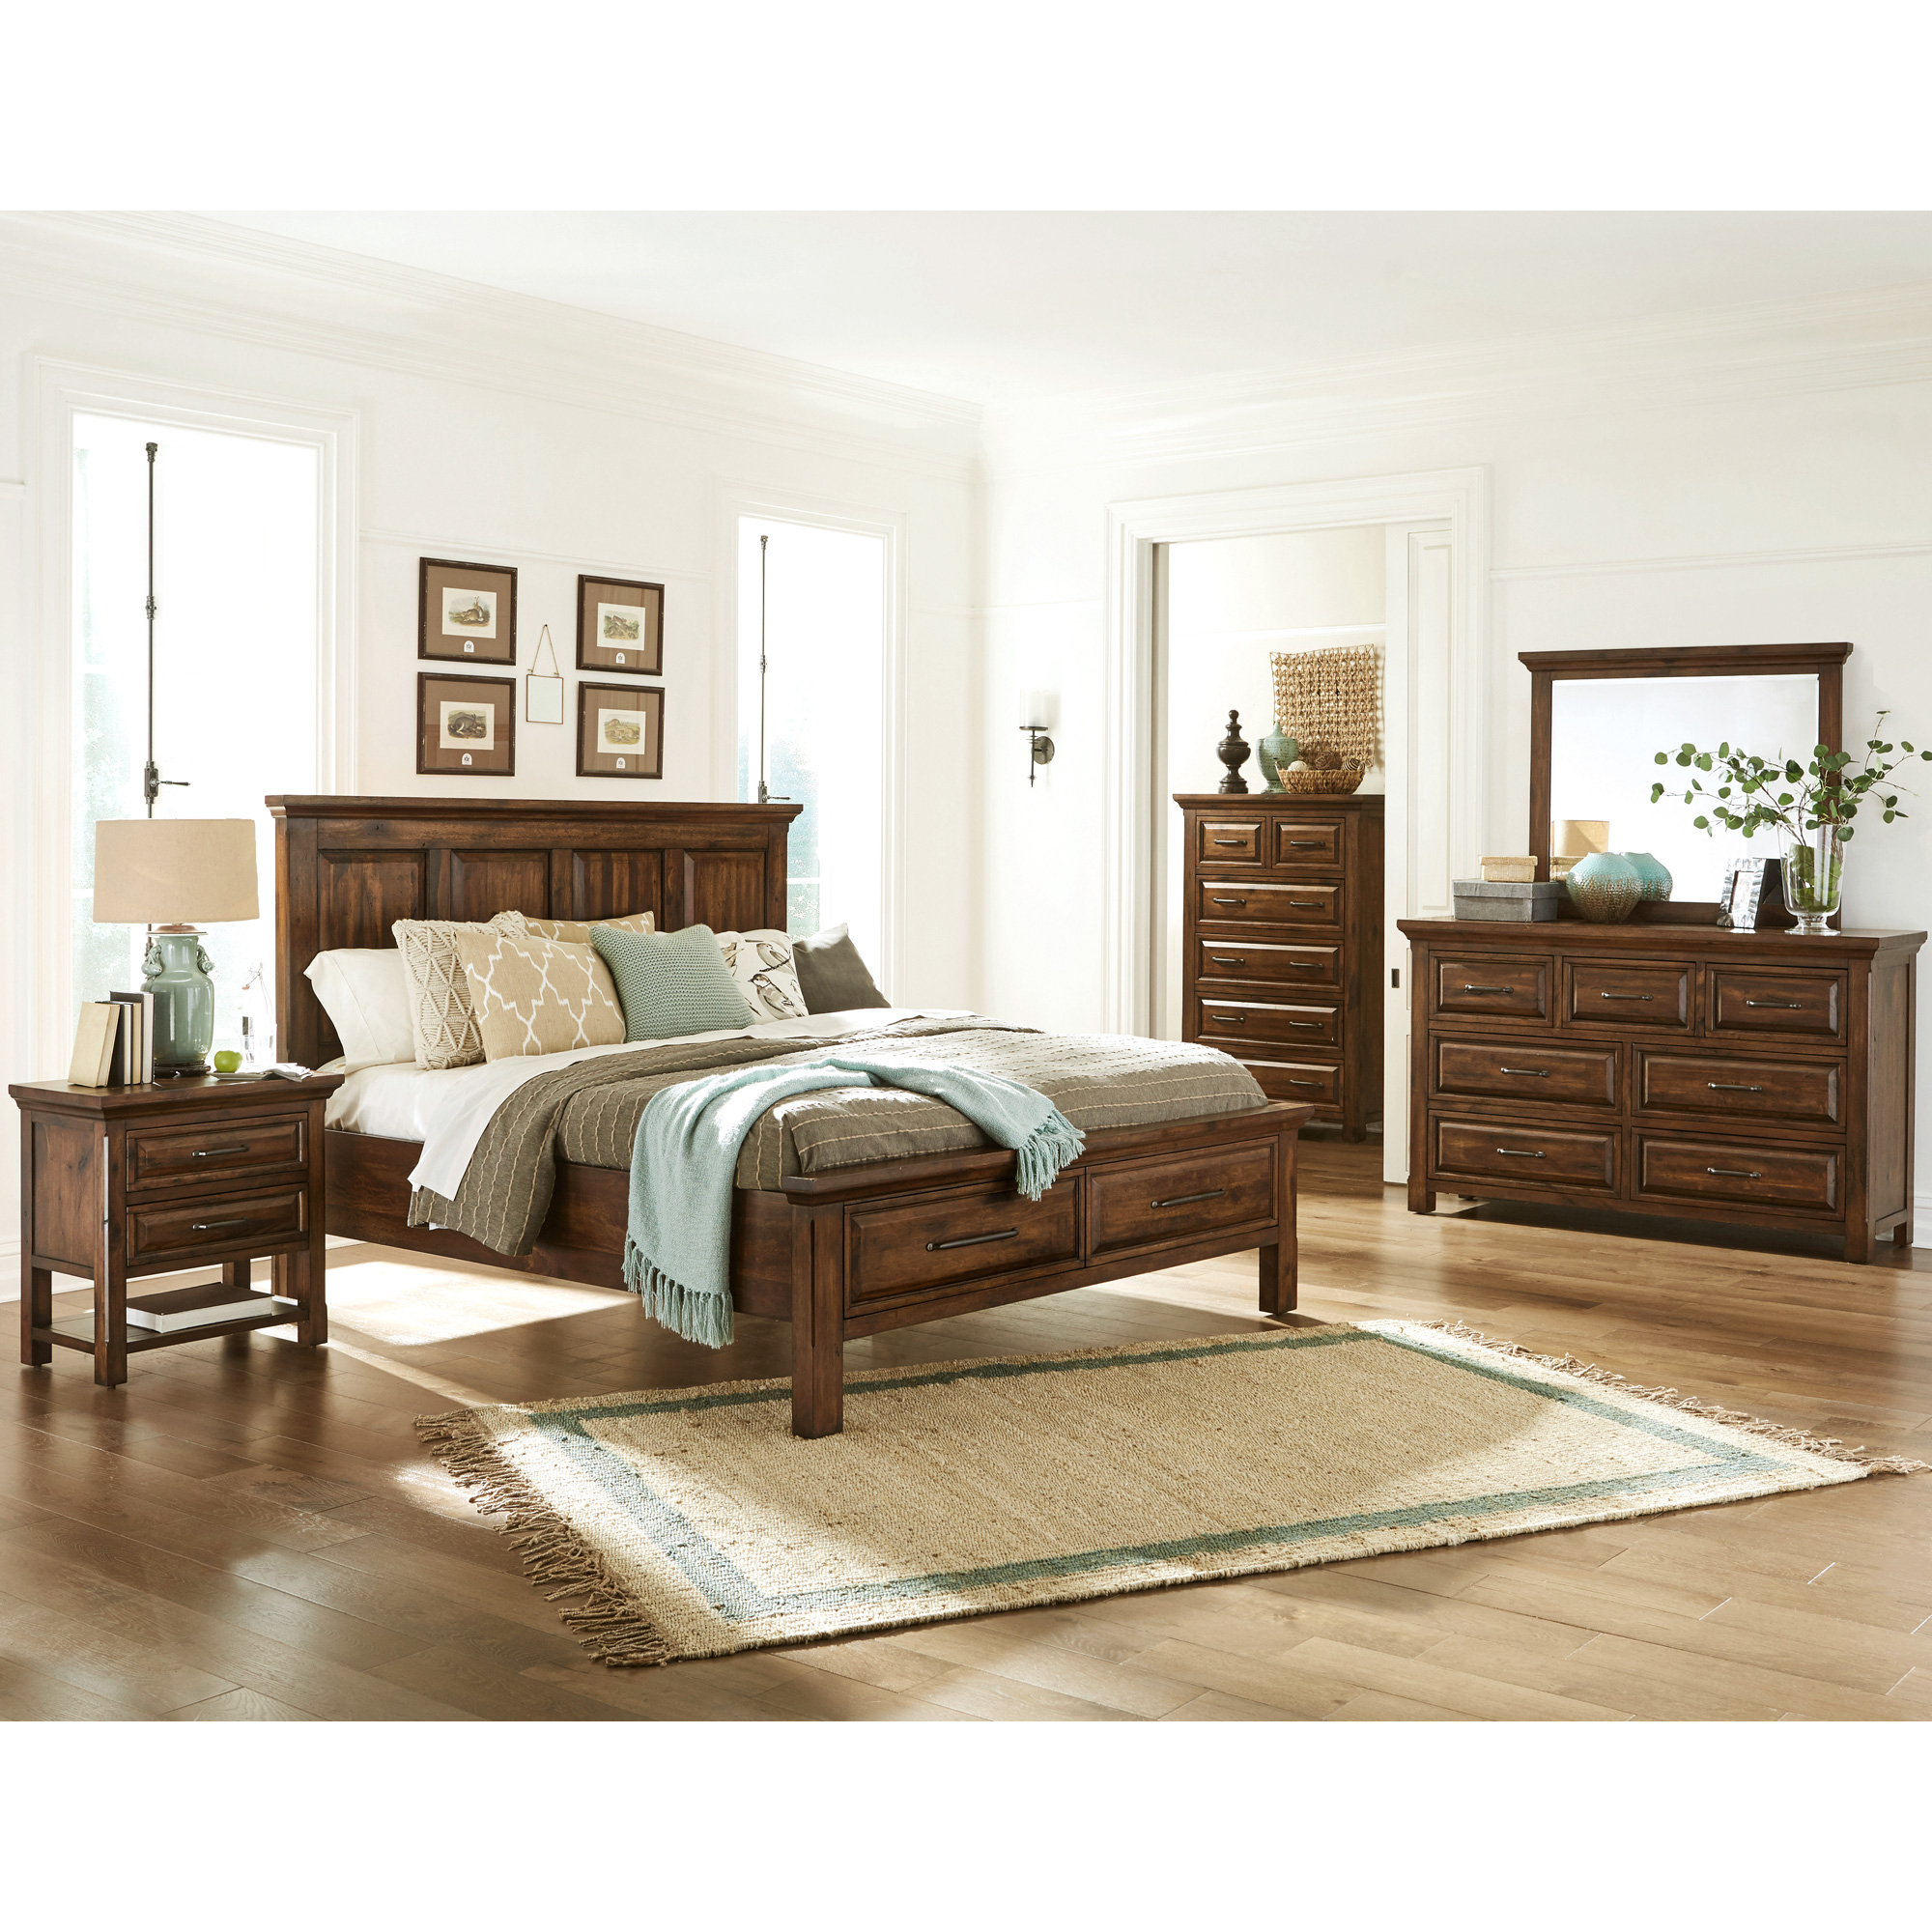 Napa Furniture   Hill Crest Dark Chestnut Queen 4 Piece Room Group Bedroom Set